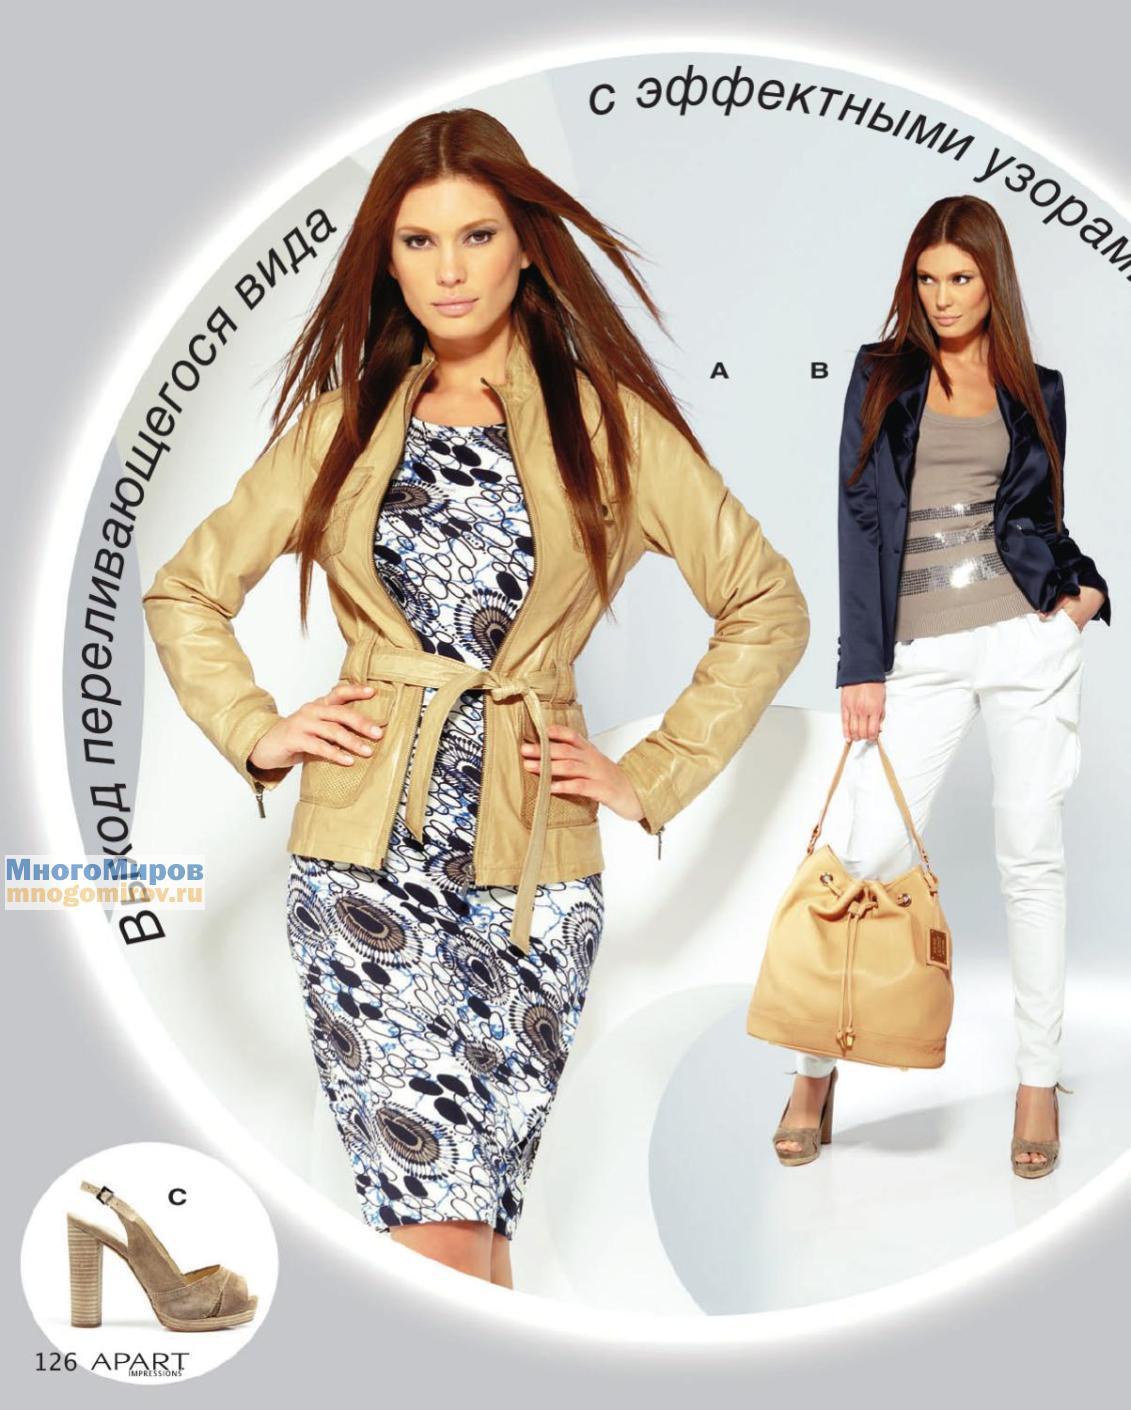 Каталоги Одежды Онлайн